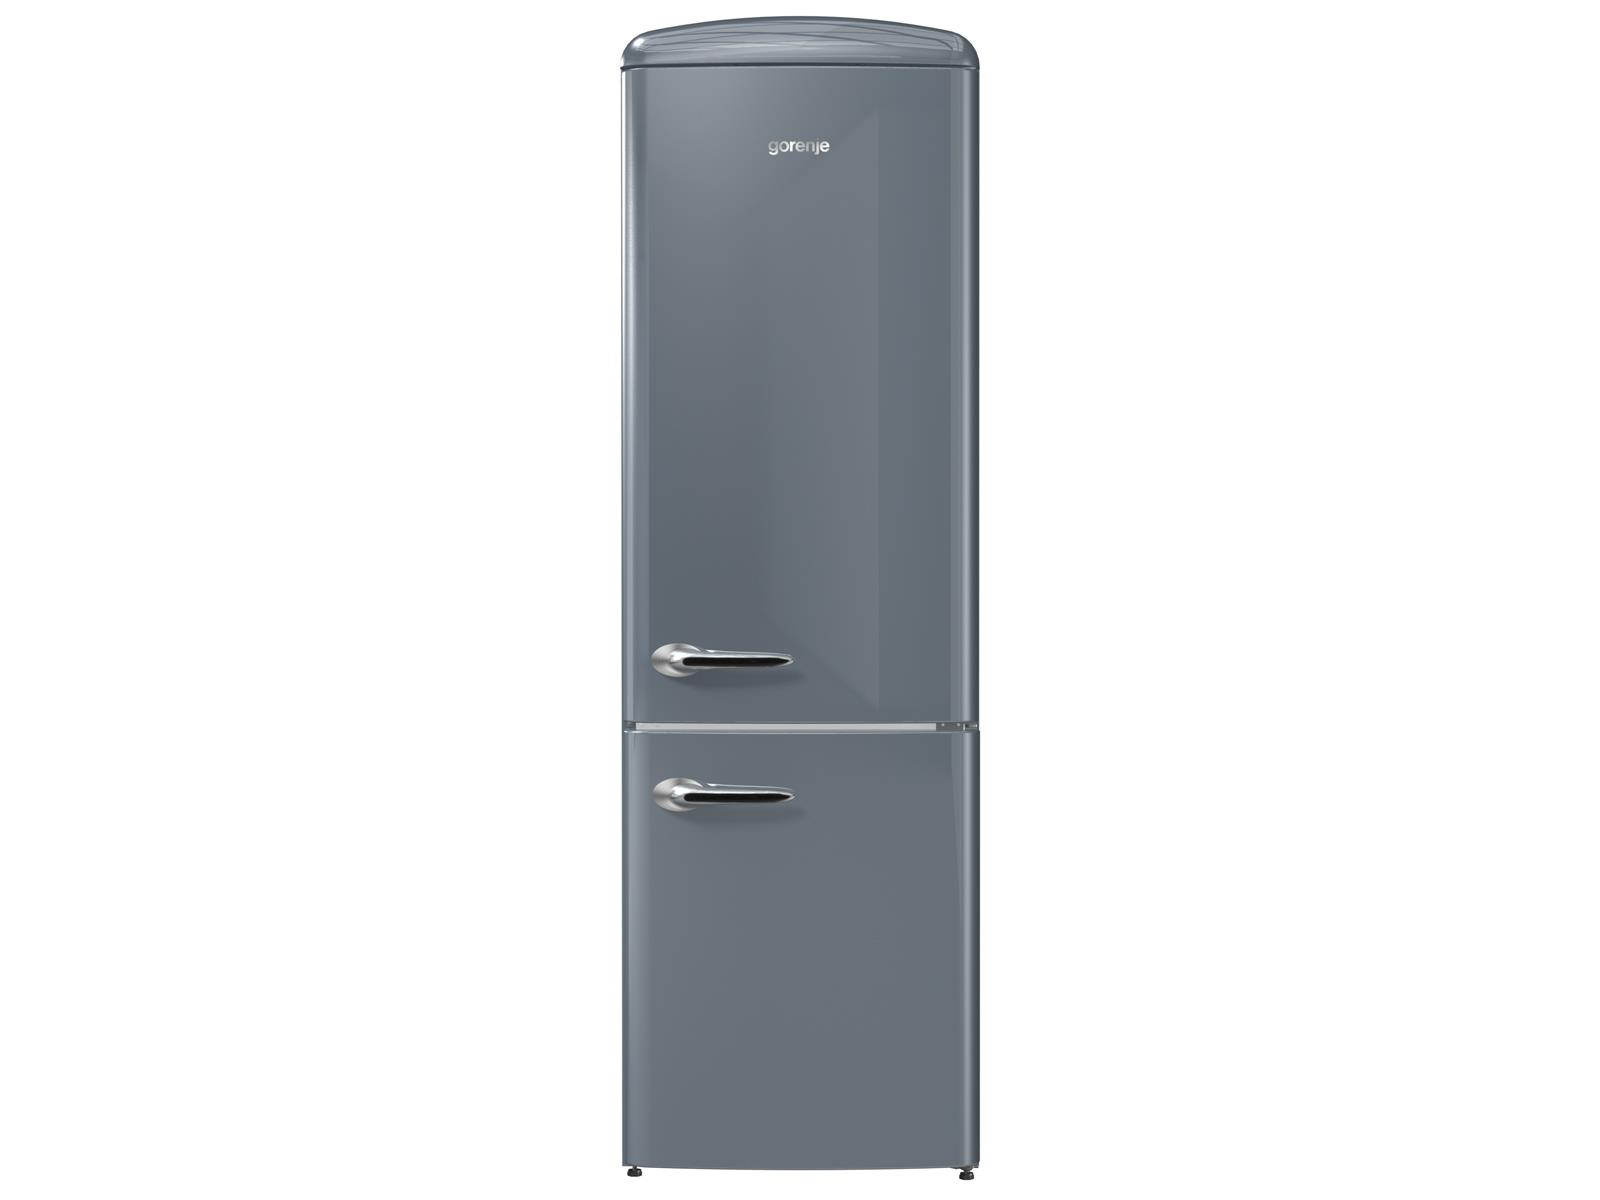 Gorenje Kühlschrank Anleitung : Gorenje kühlschrank ork bedienungsanleitung: kühlschrank